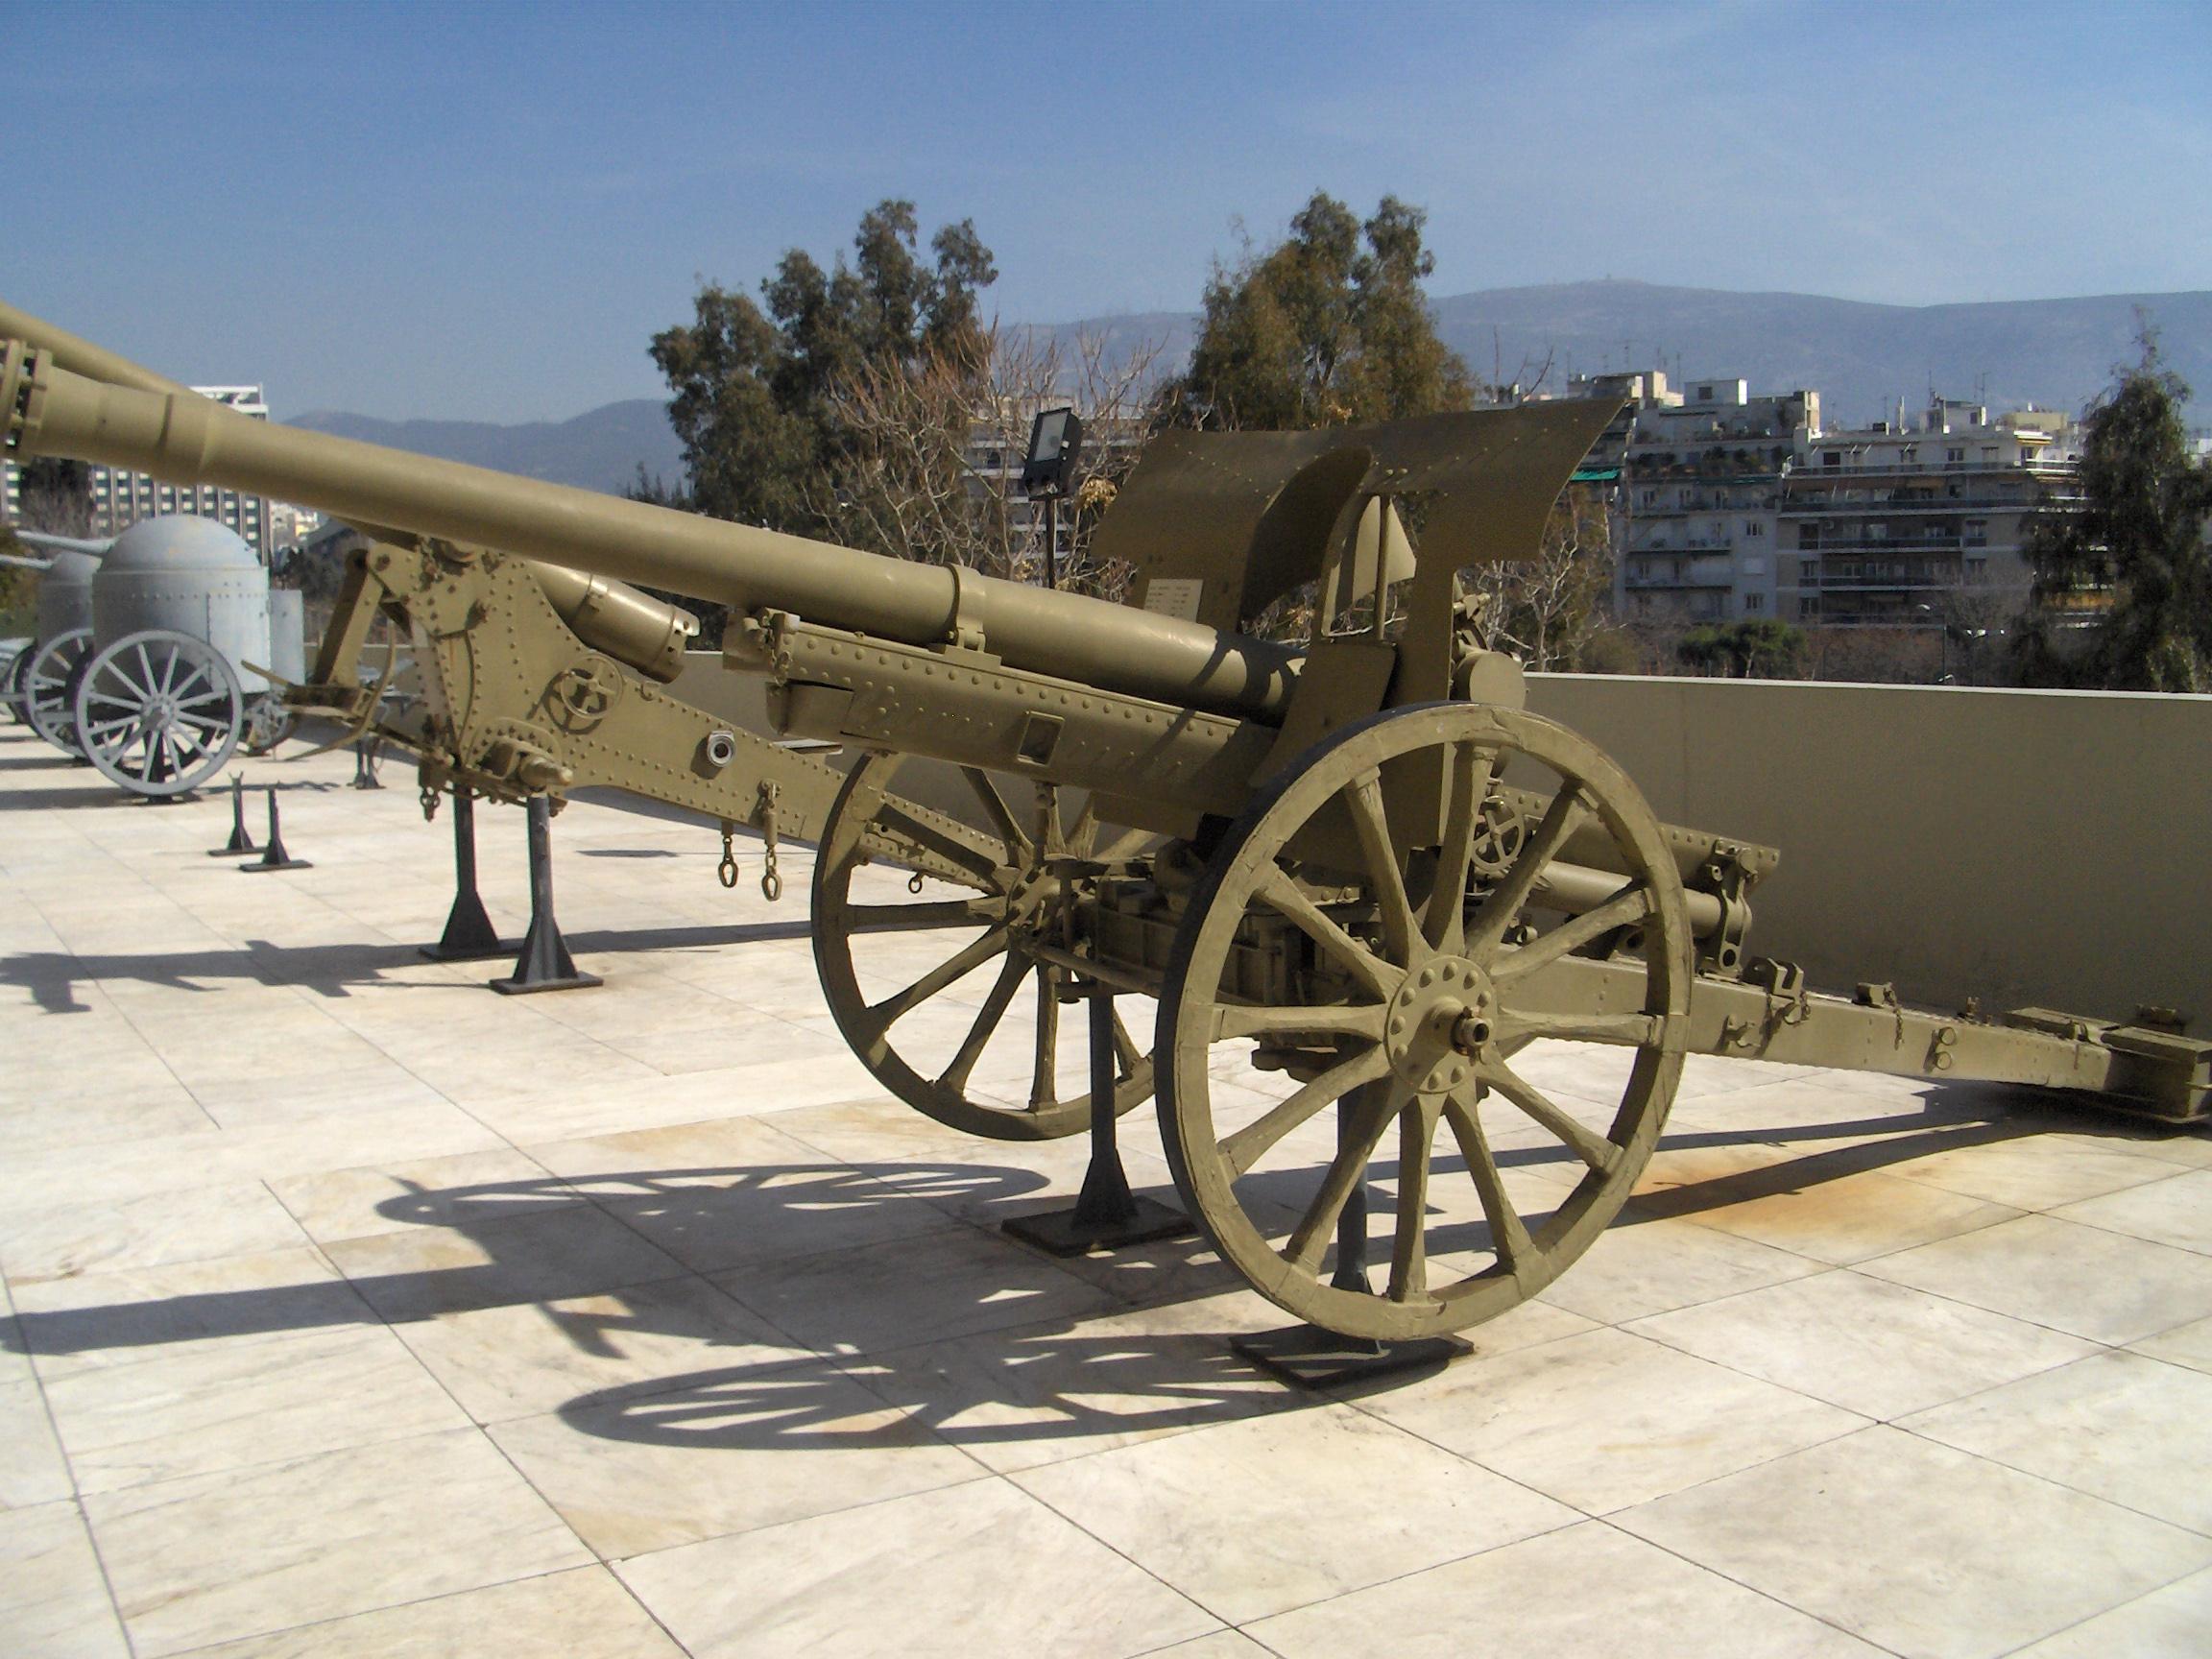 War_Museum_Athens_-_Schneider_field_gun_-_6744.jpg